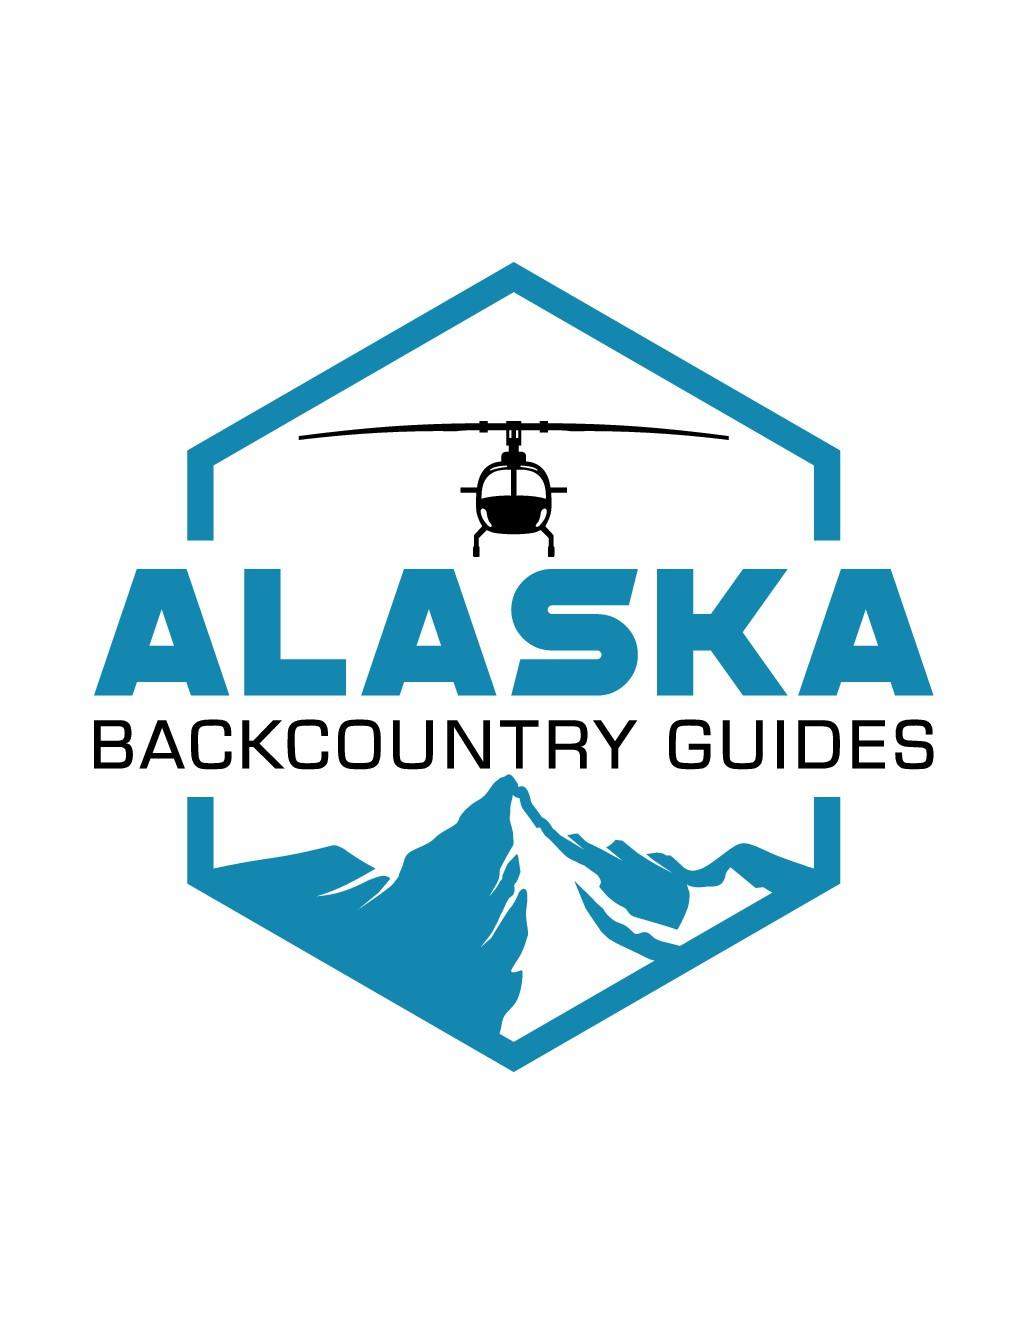 Alaskan Heliskiing and Snowboarding Operation Seeking New Logo!